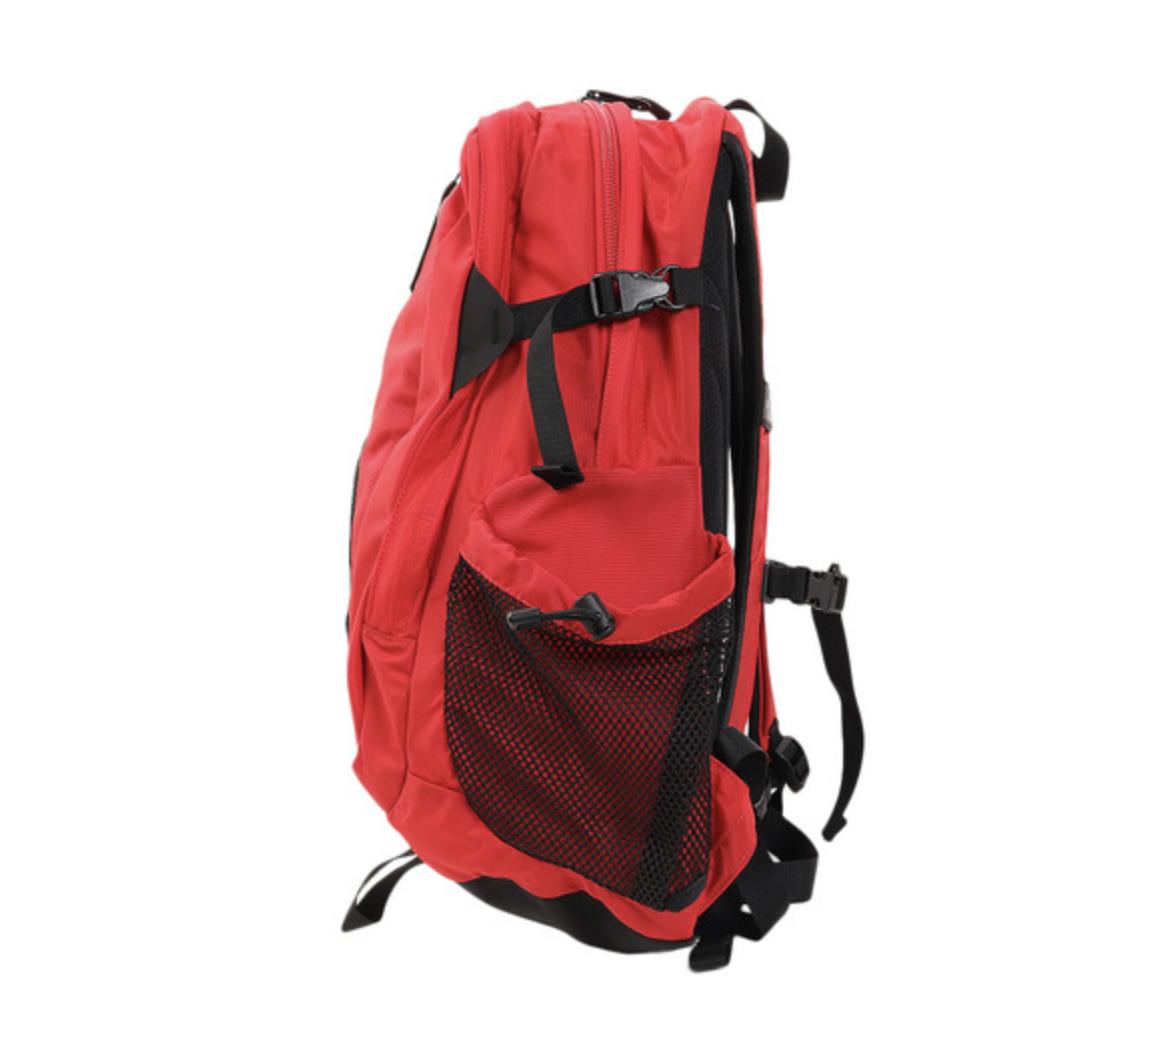 f:id:thebackpack:20191007201728p:plain